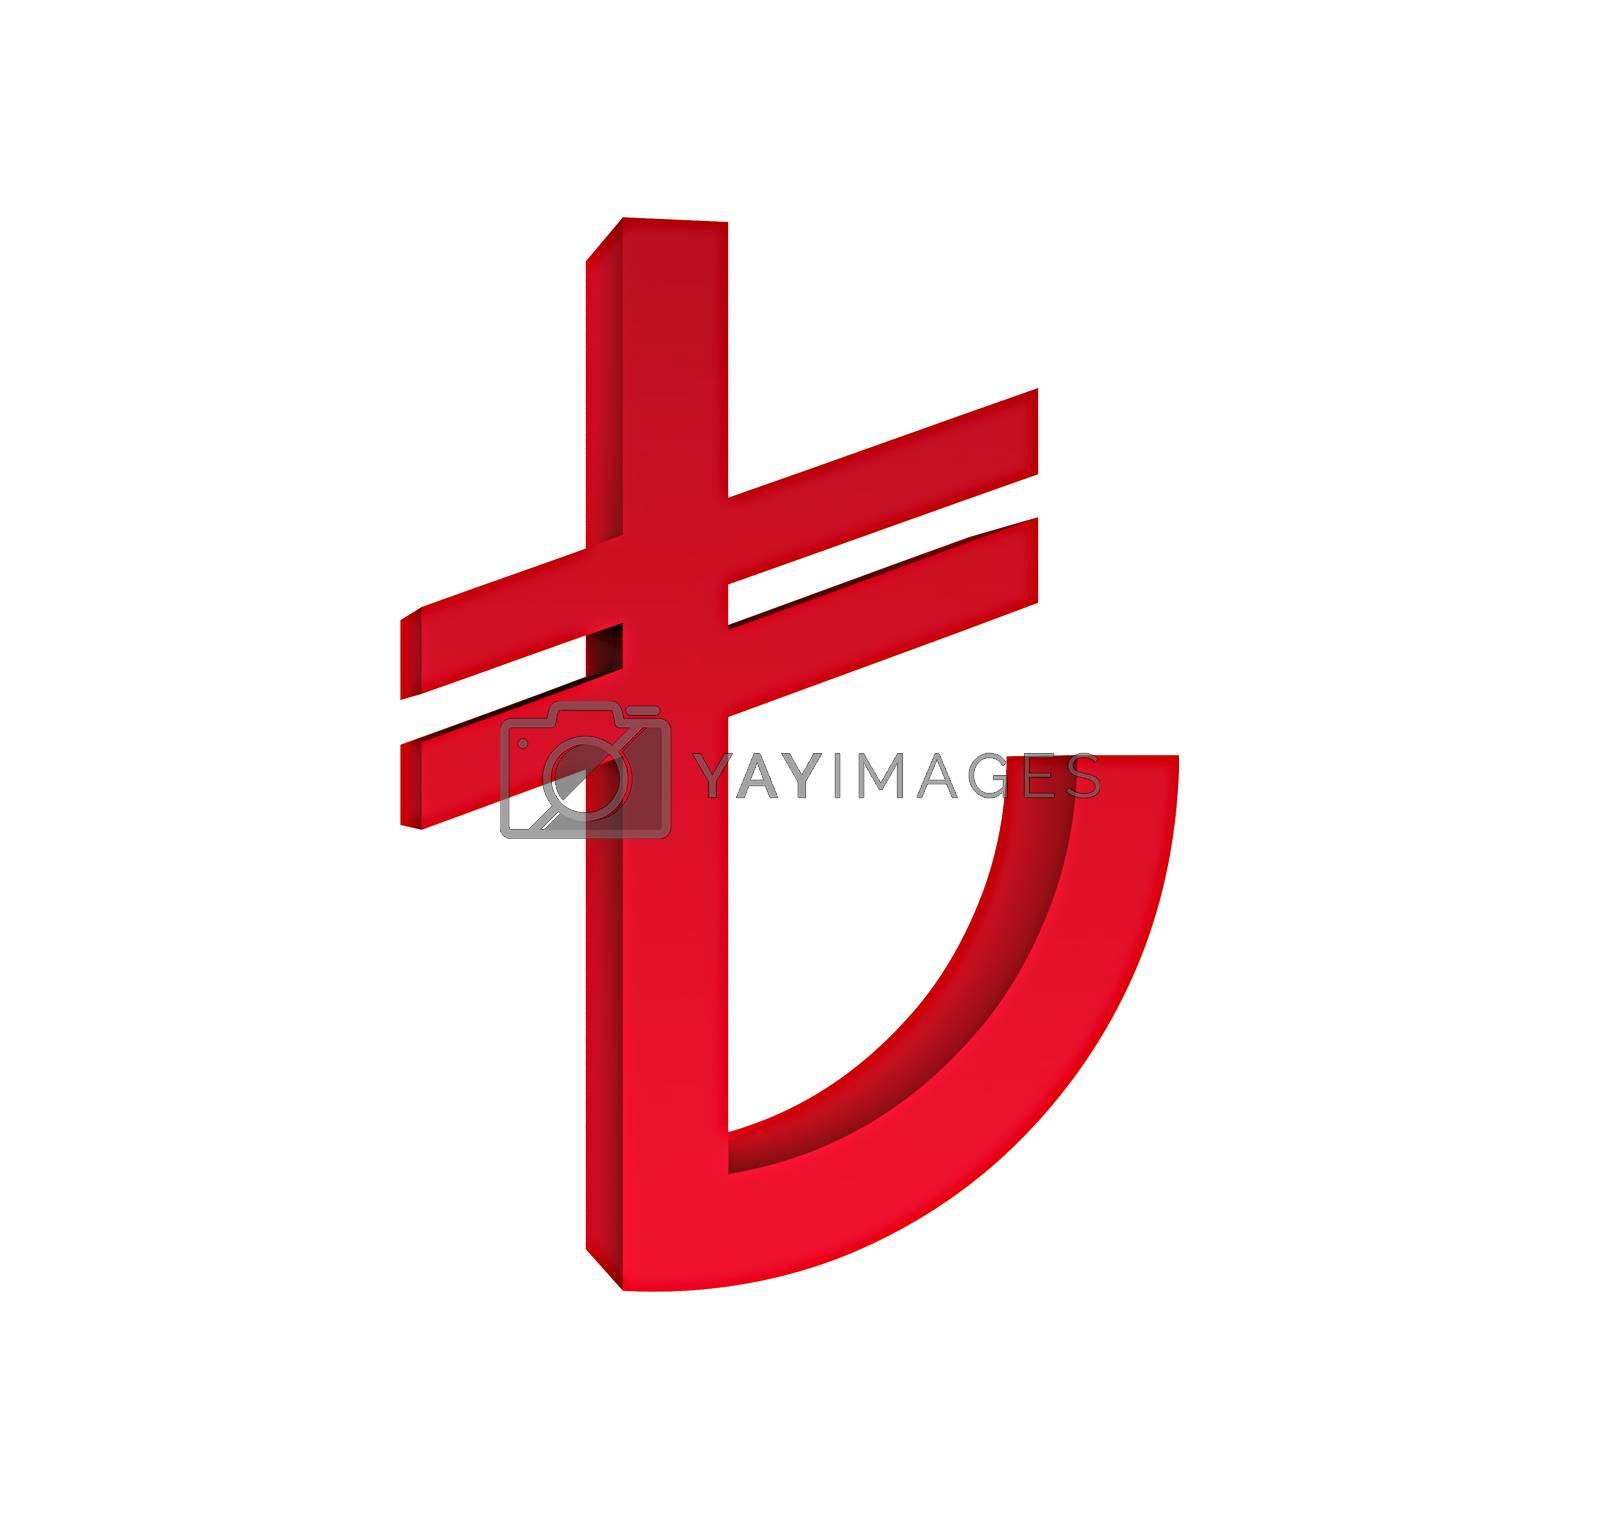 d tl symbol turkish liras isolated.